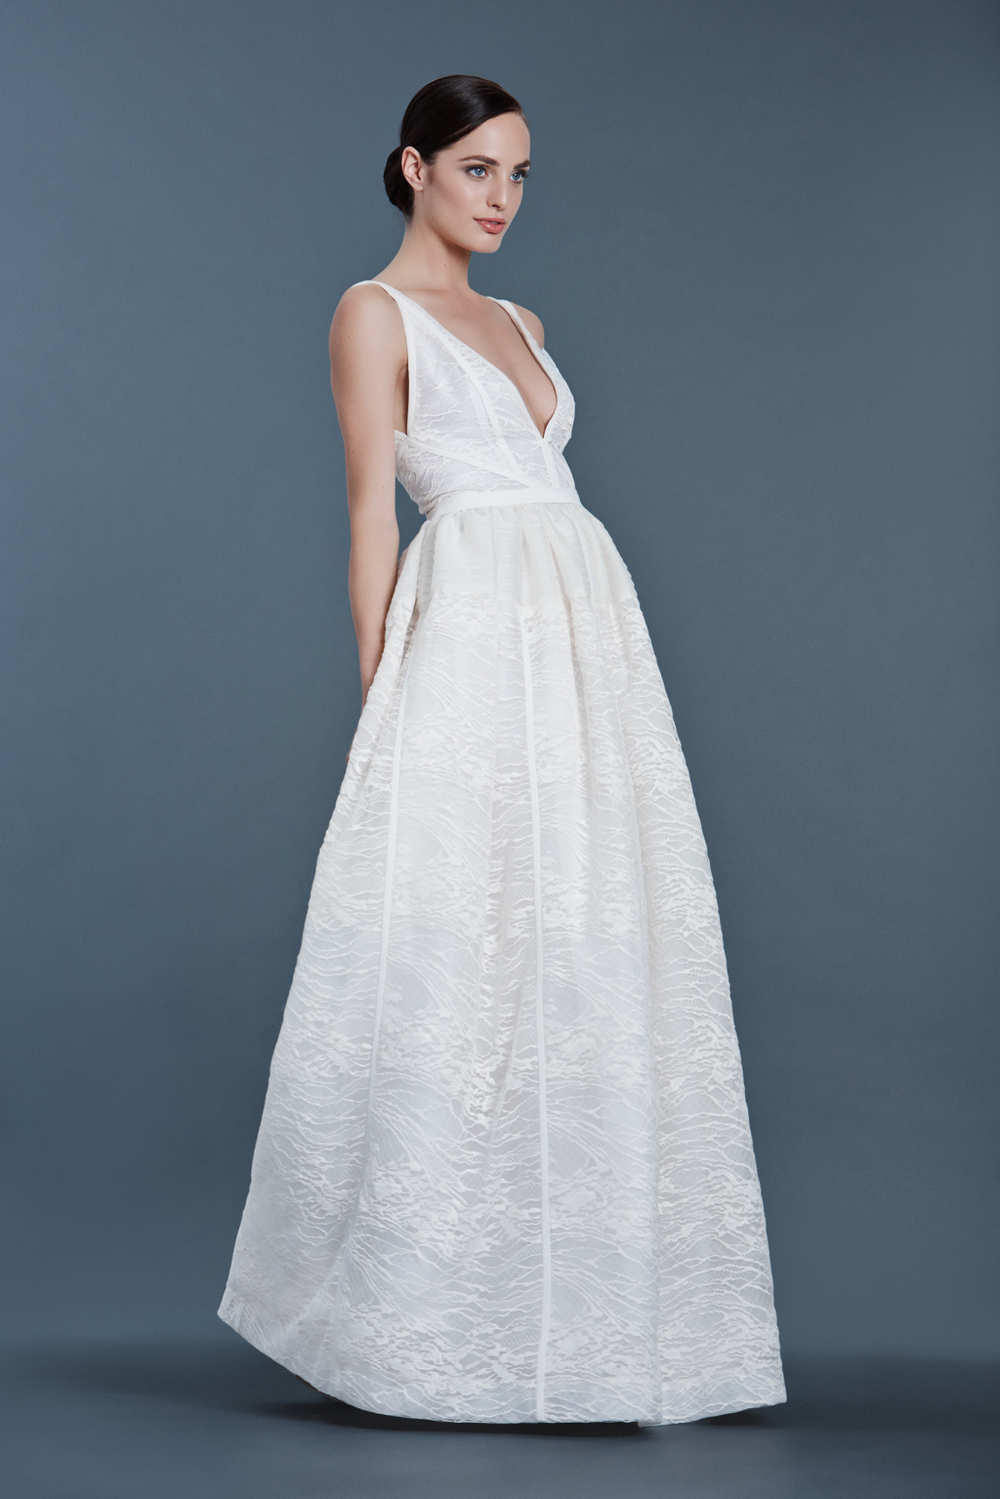 j-mendel-bridal-fall-16-06.jpg